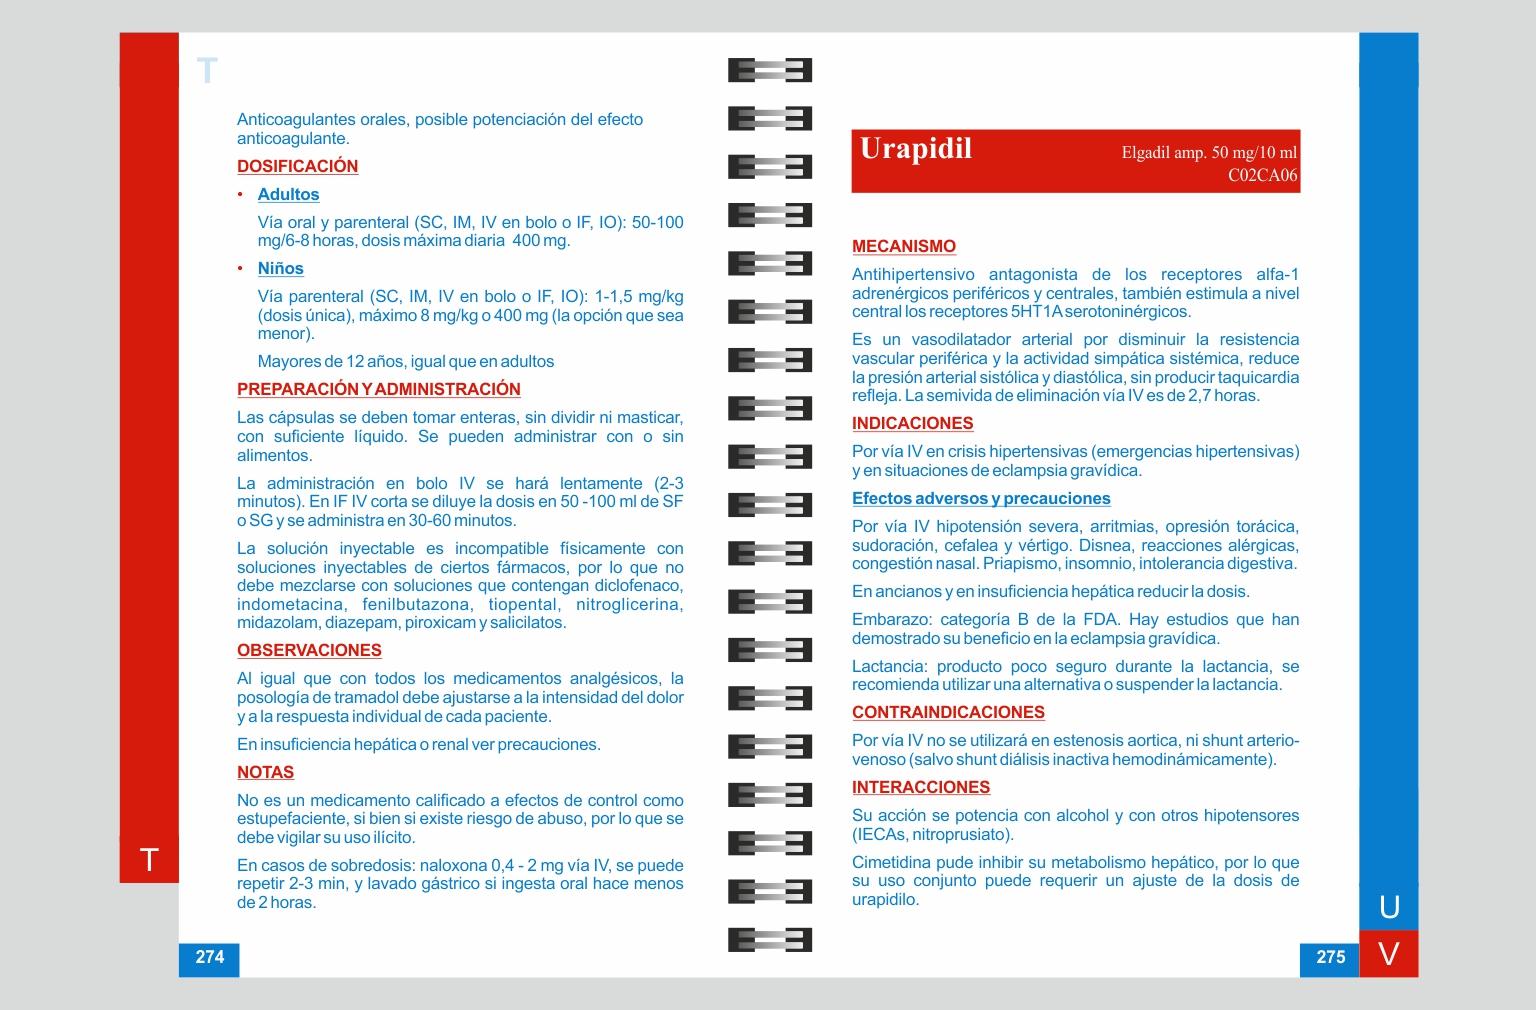 Int Guía farmacológica 2